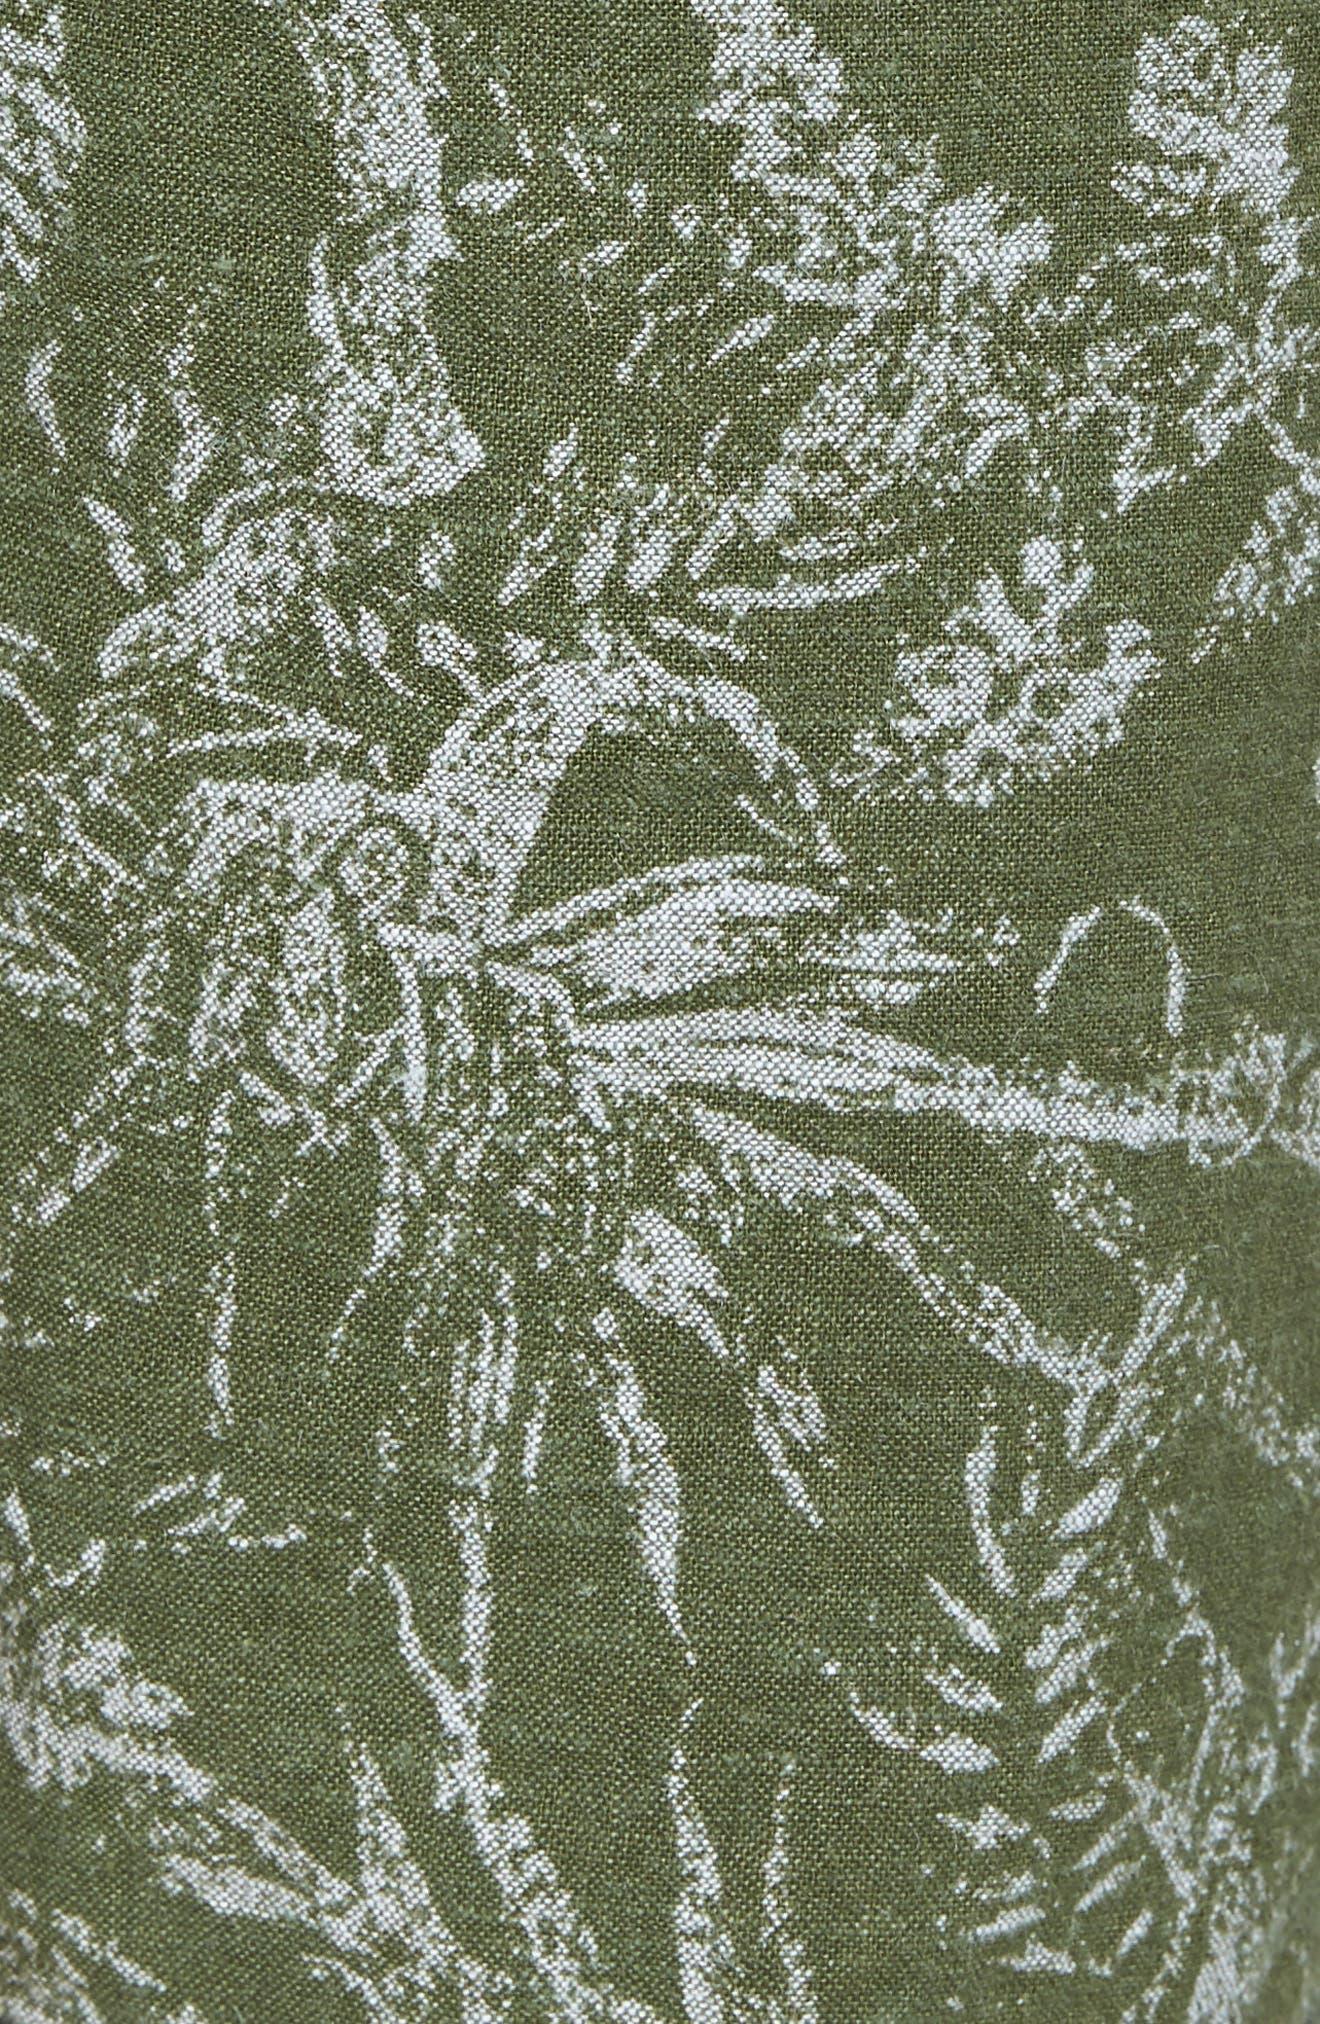 E-Waist Print Linen Blend Shorts,                             Alternate thumbnail 5, color,                             310